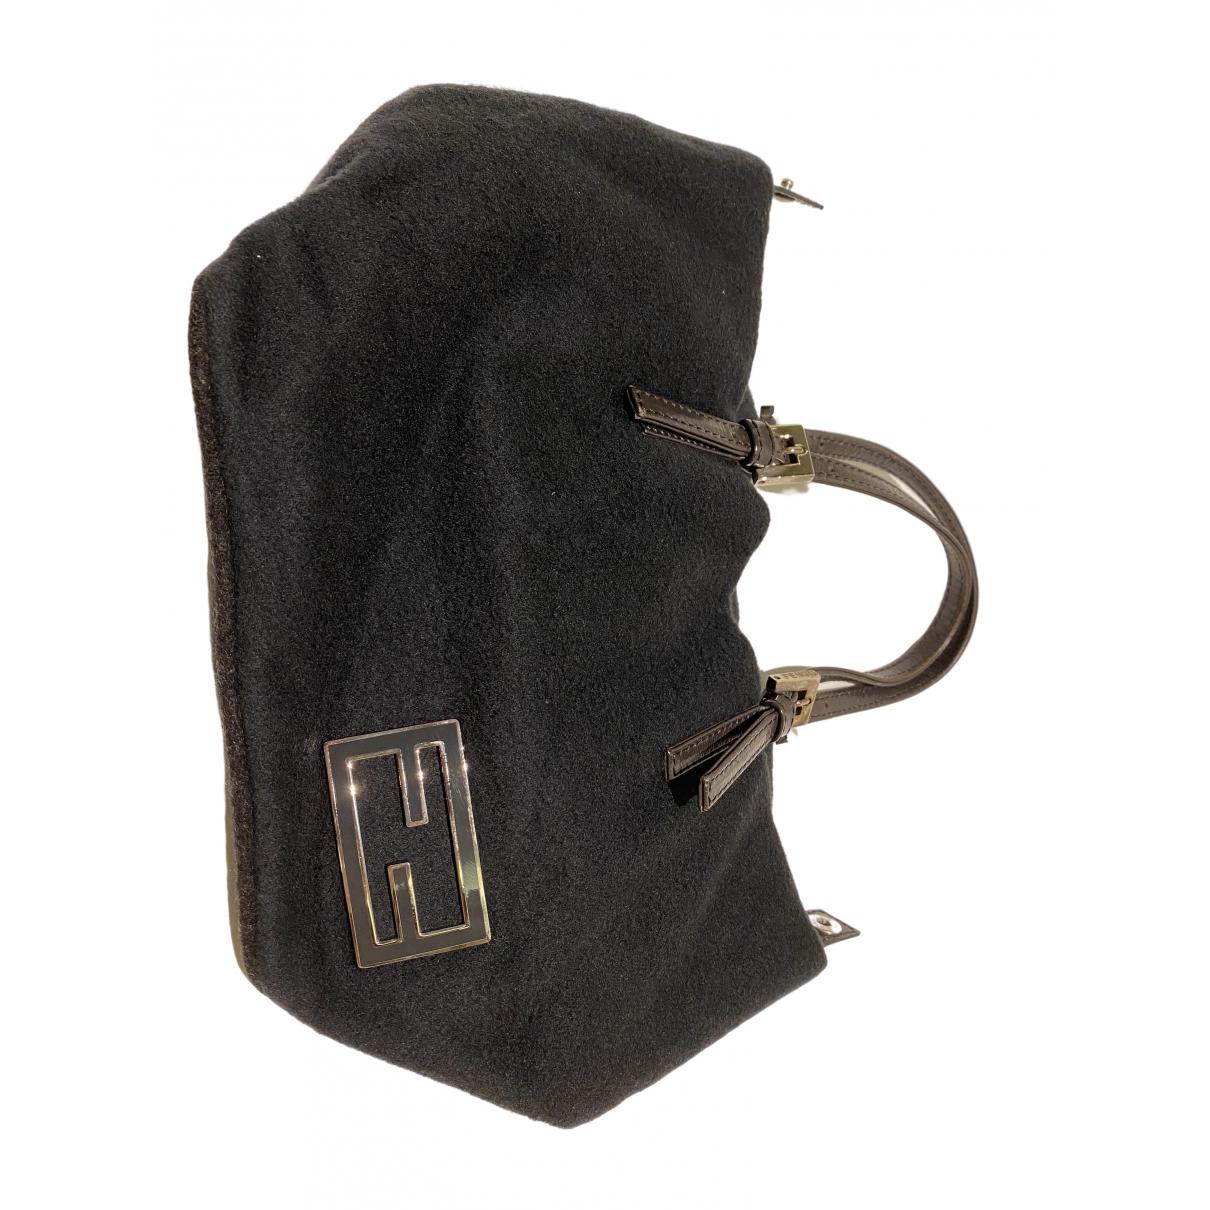 Fendi \N Grey Suede handbag for Women \N